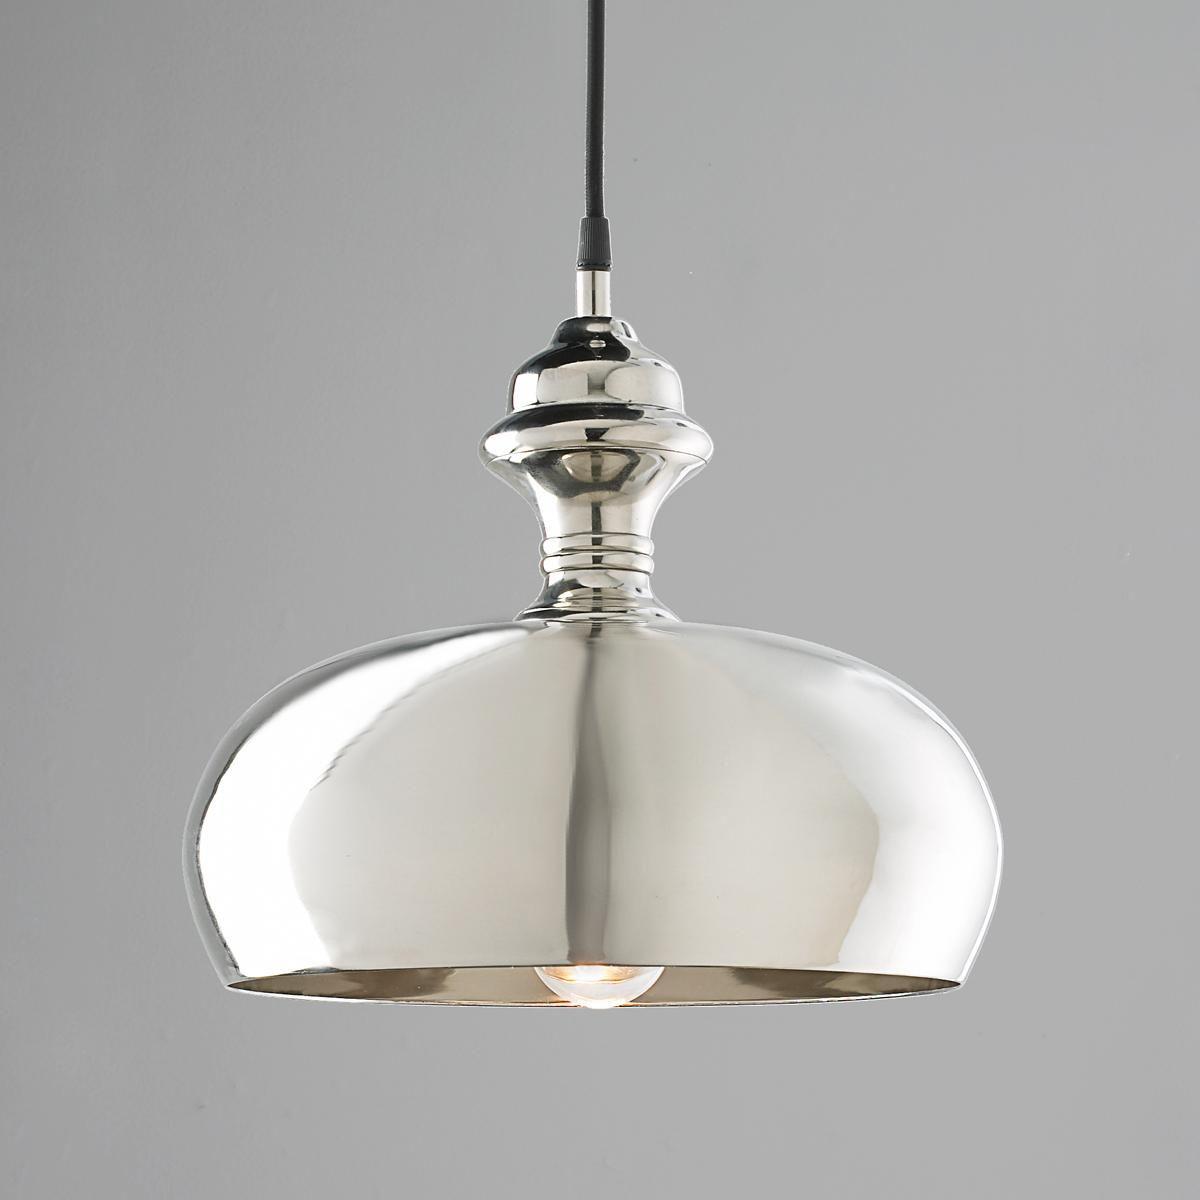 Silver onion dome pendant light kitchen pinterest pendant